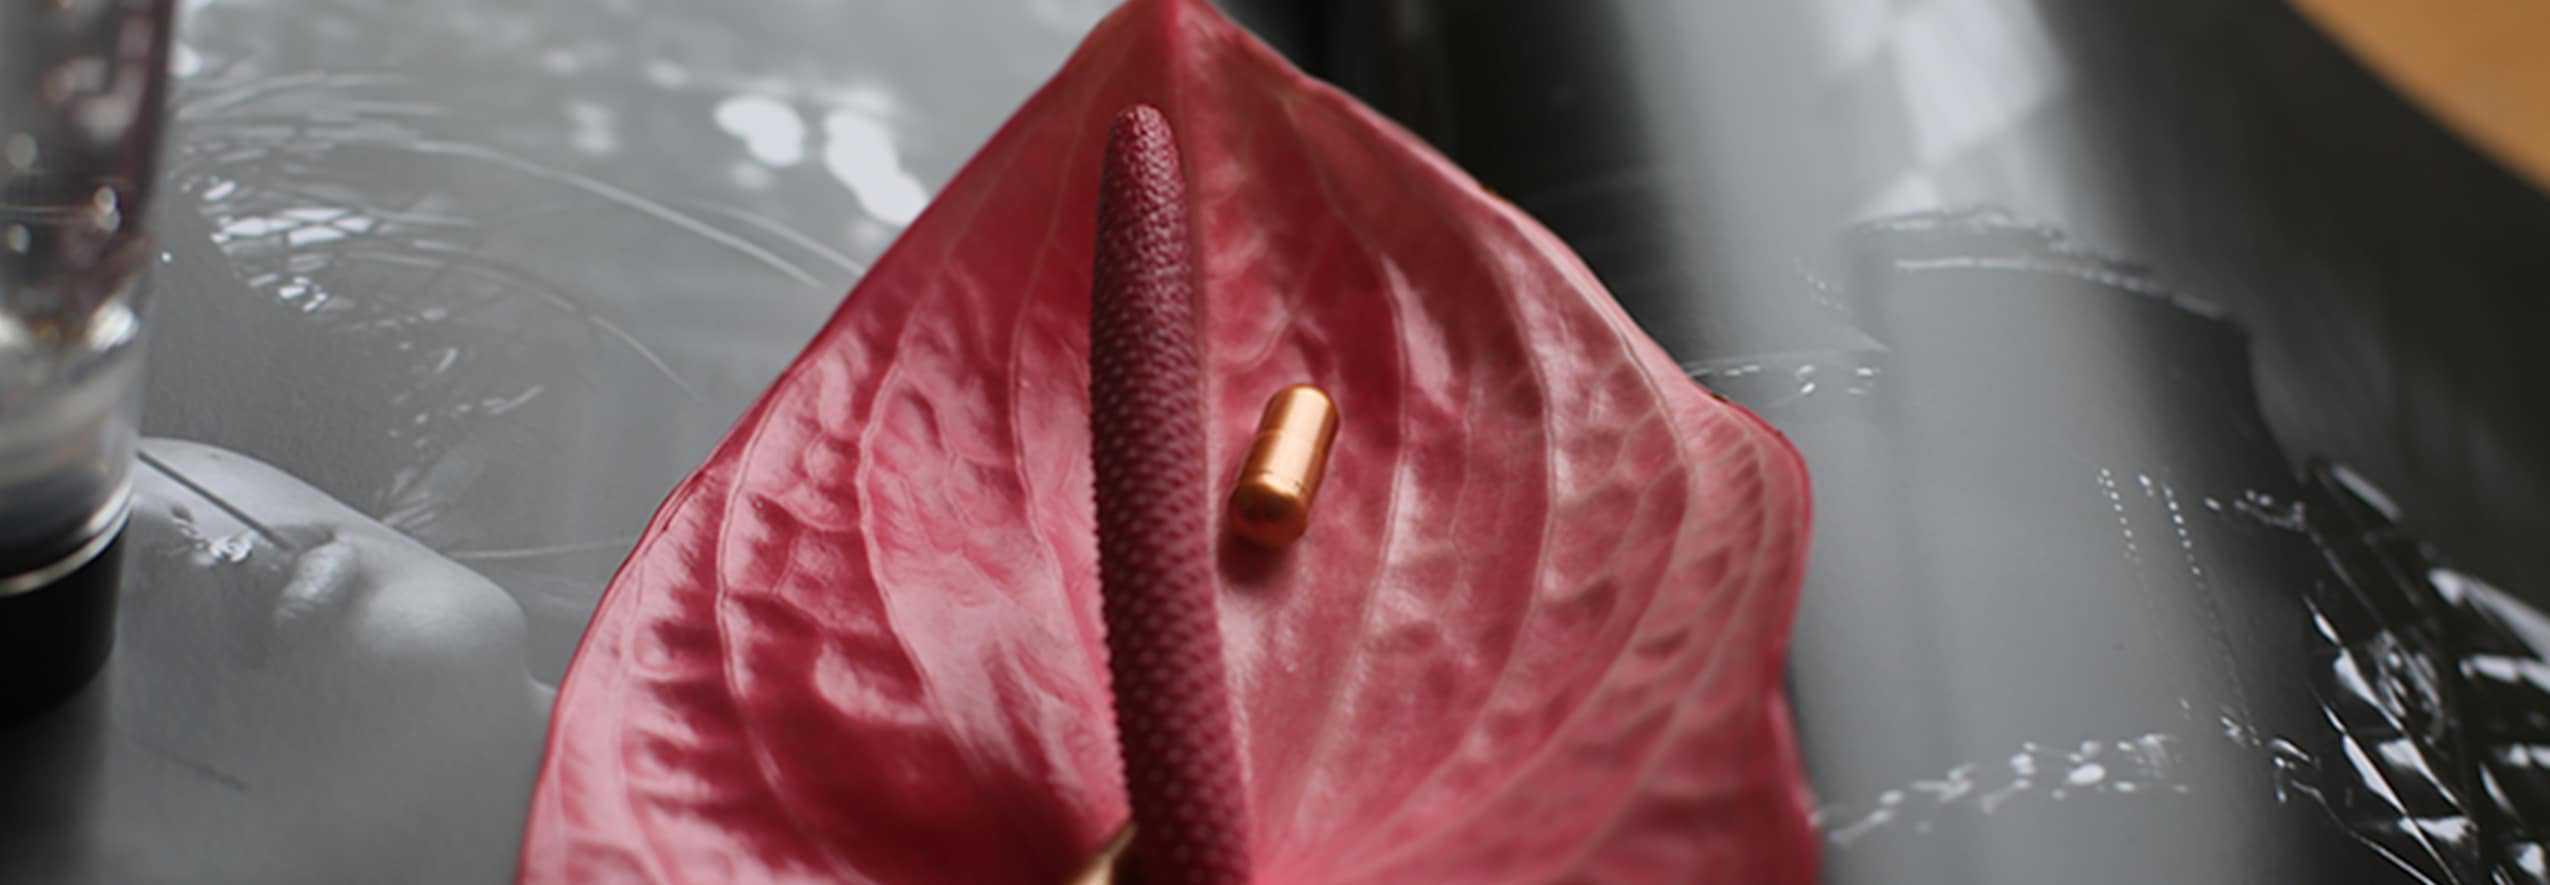 skin tablet in red flower